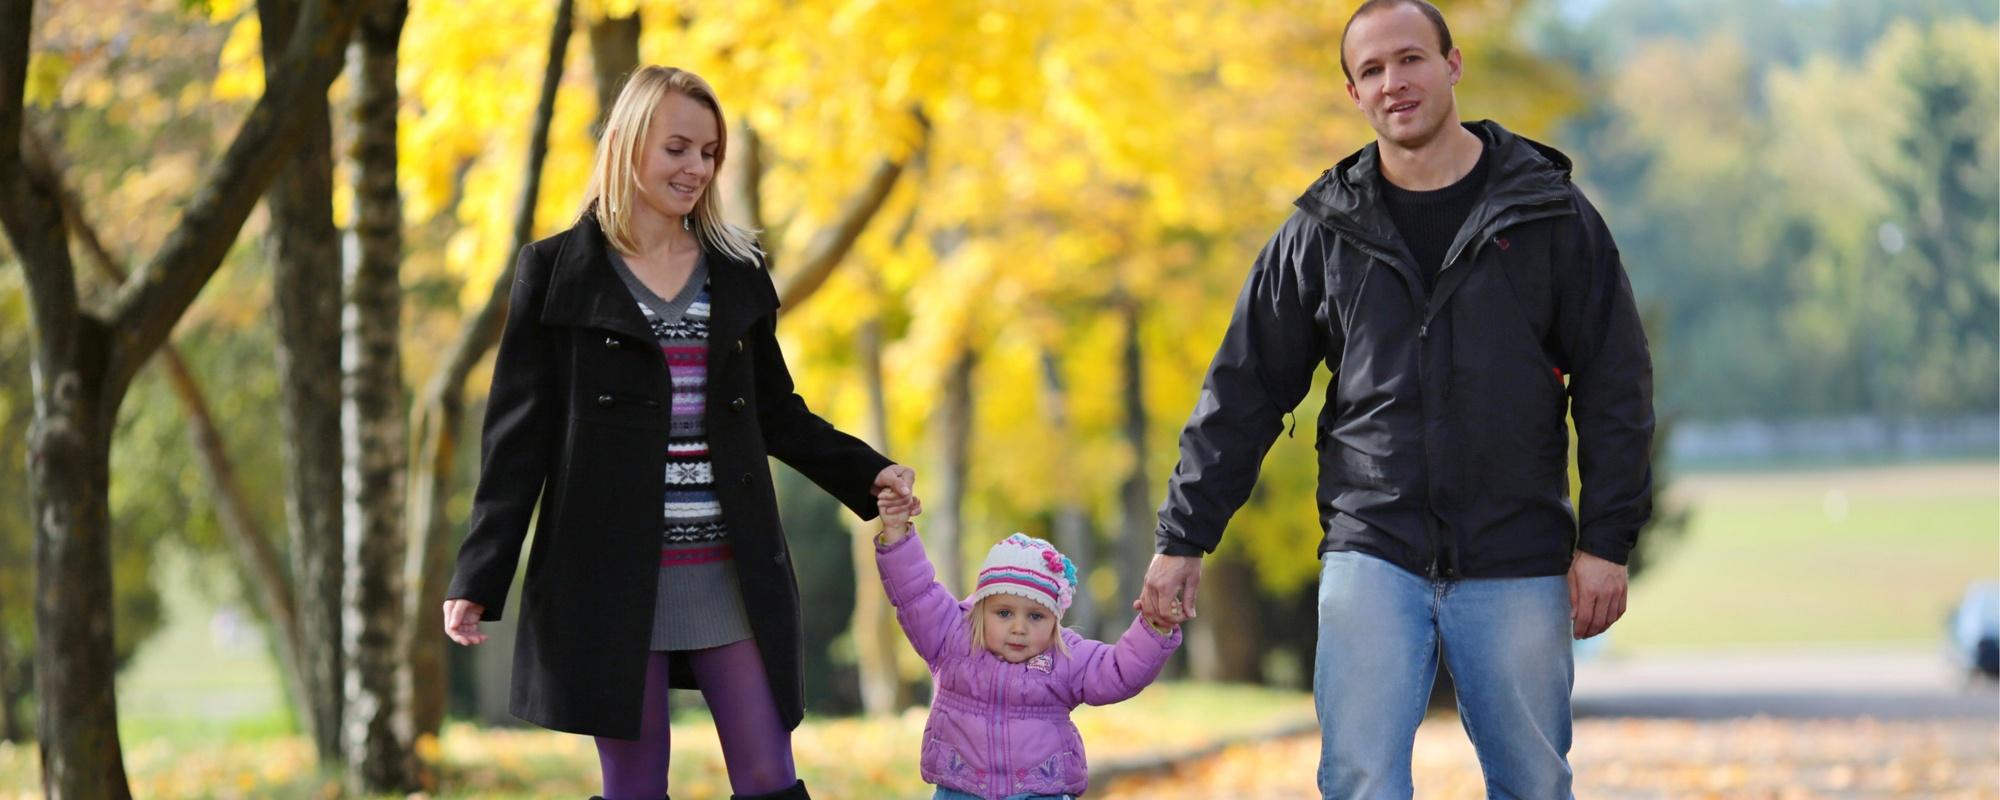 Life Insurance South Burlington VT